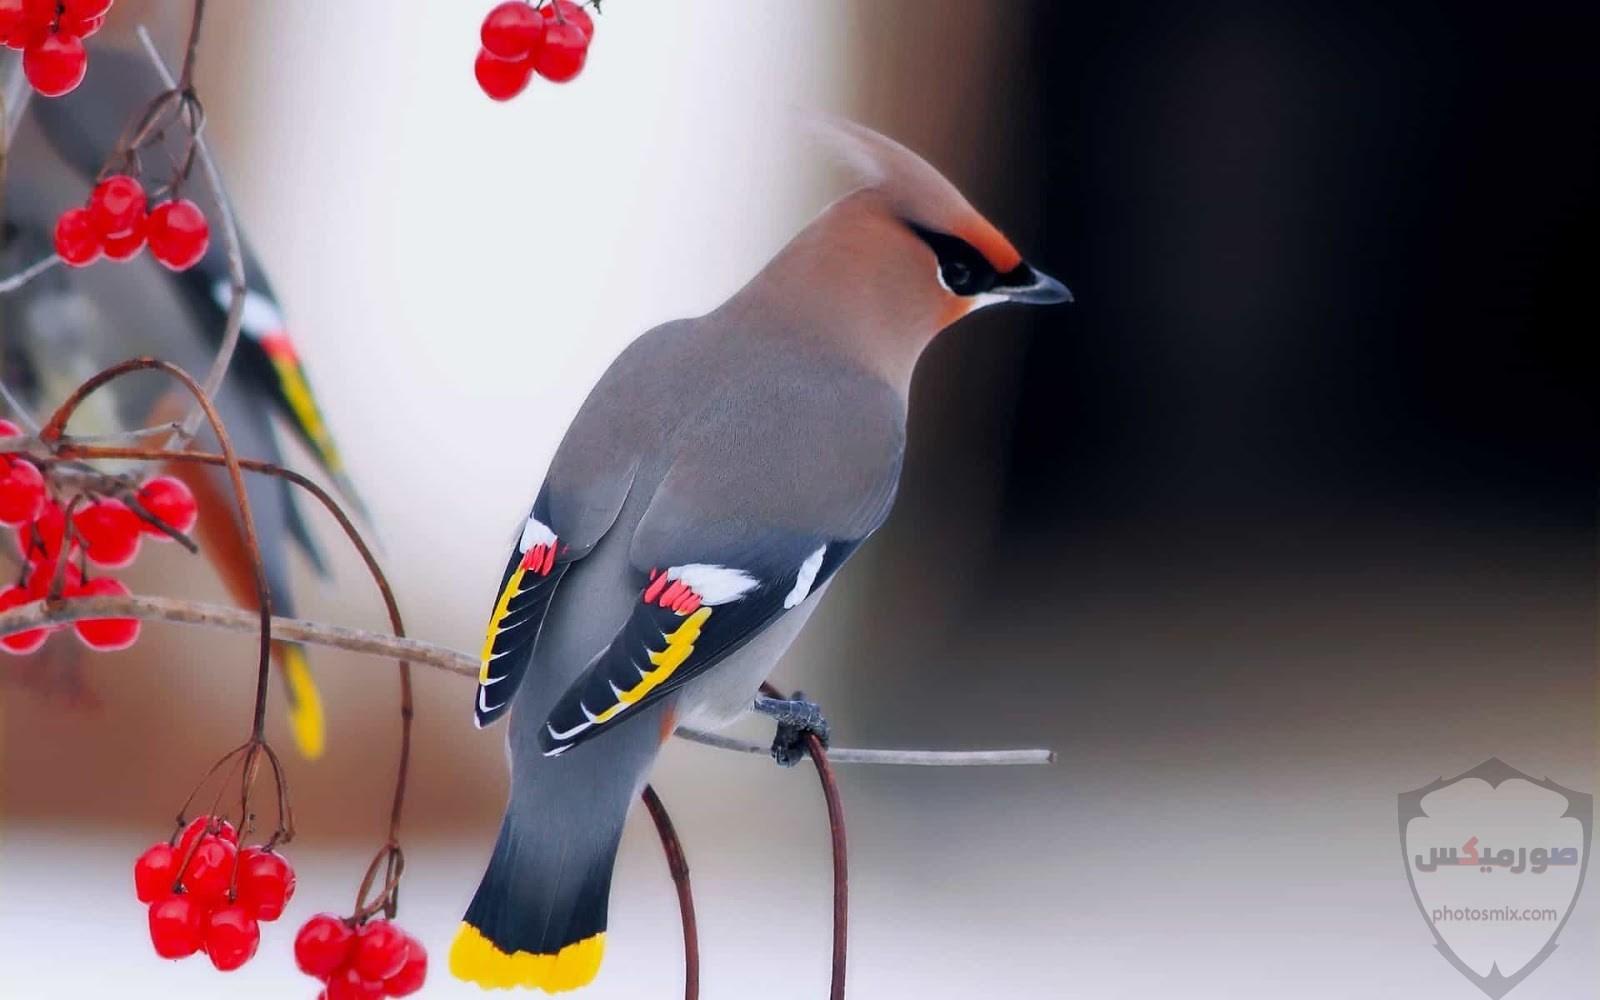 صور عصافير أجمل صور عصافير صور عصفور 2020 7